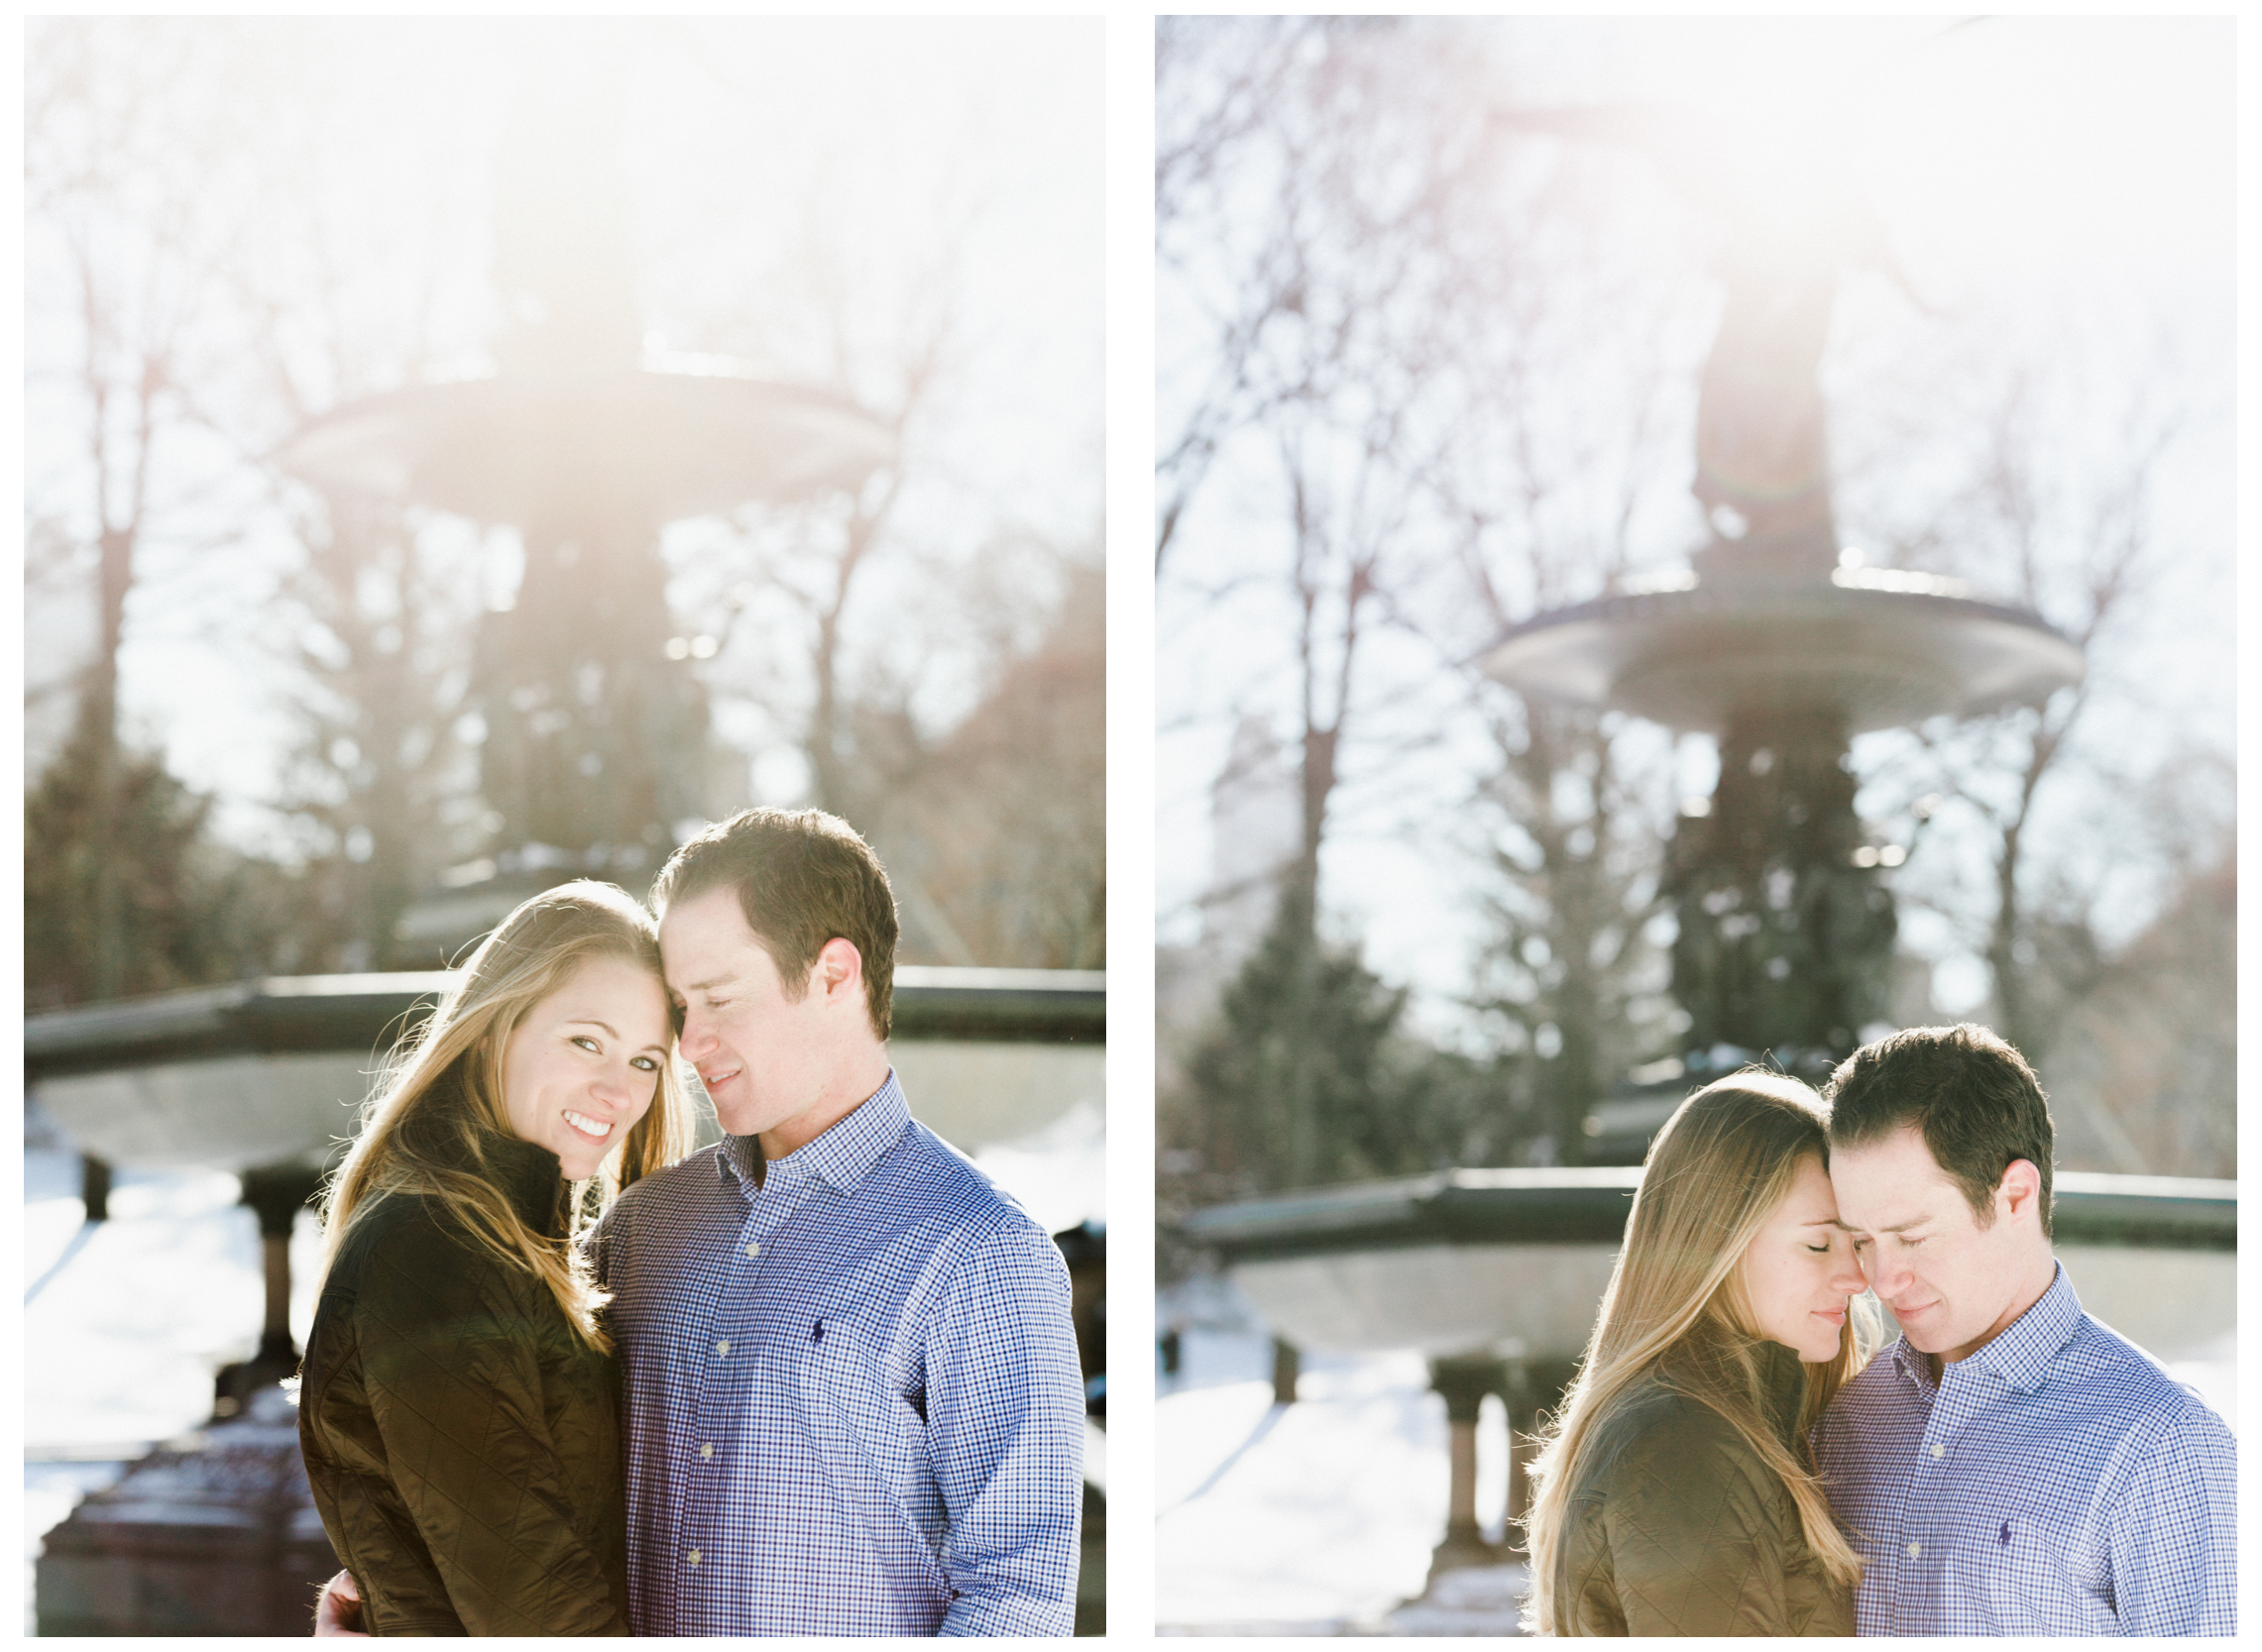 25-Central-Park-Winter-Engagement-Session-Allison-Sullivan.jpg